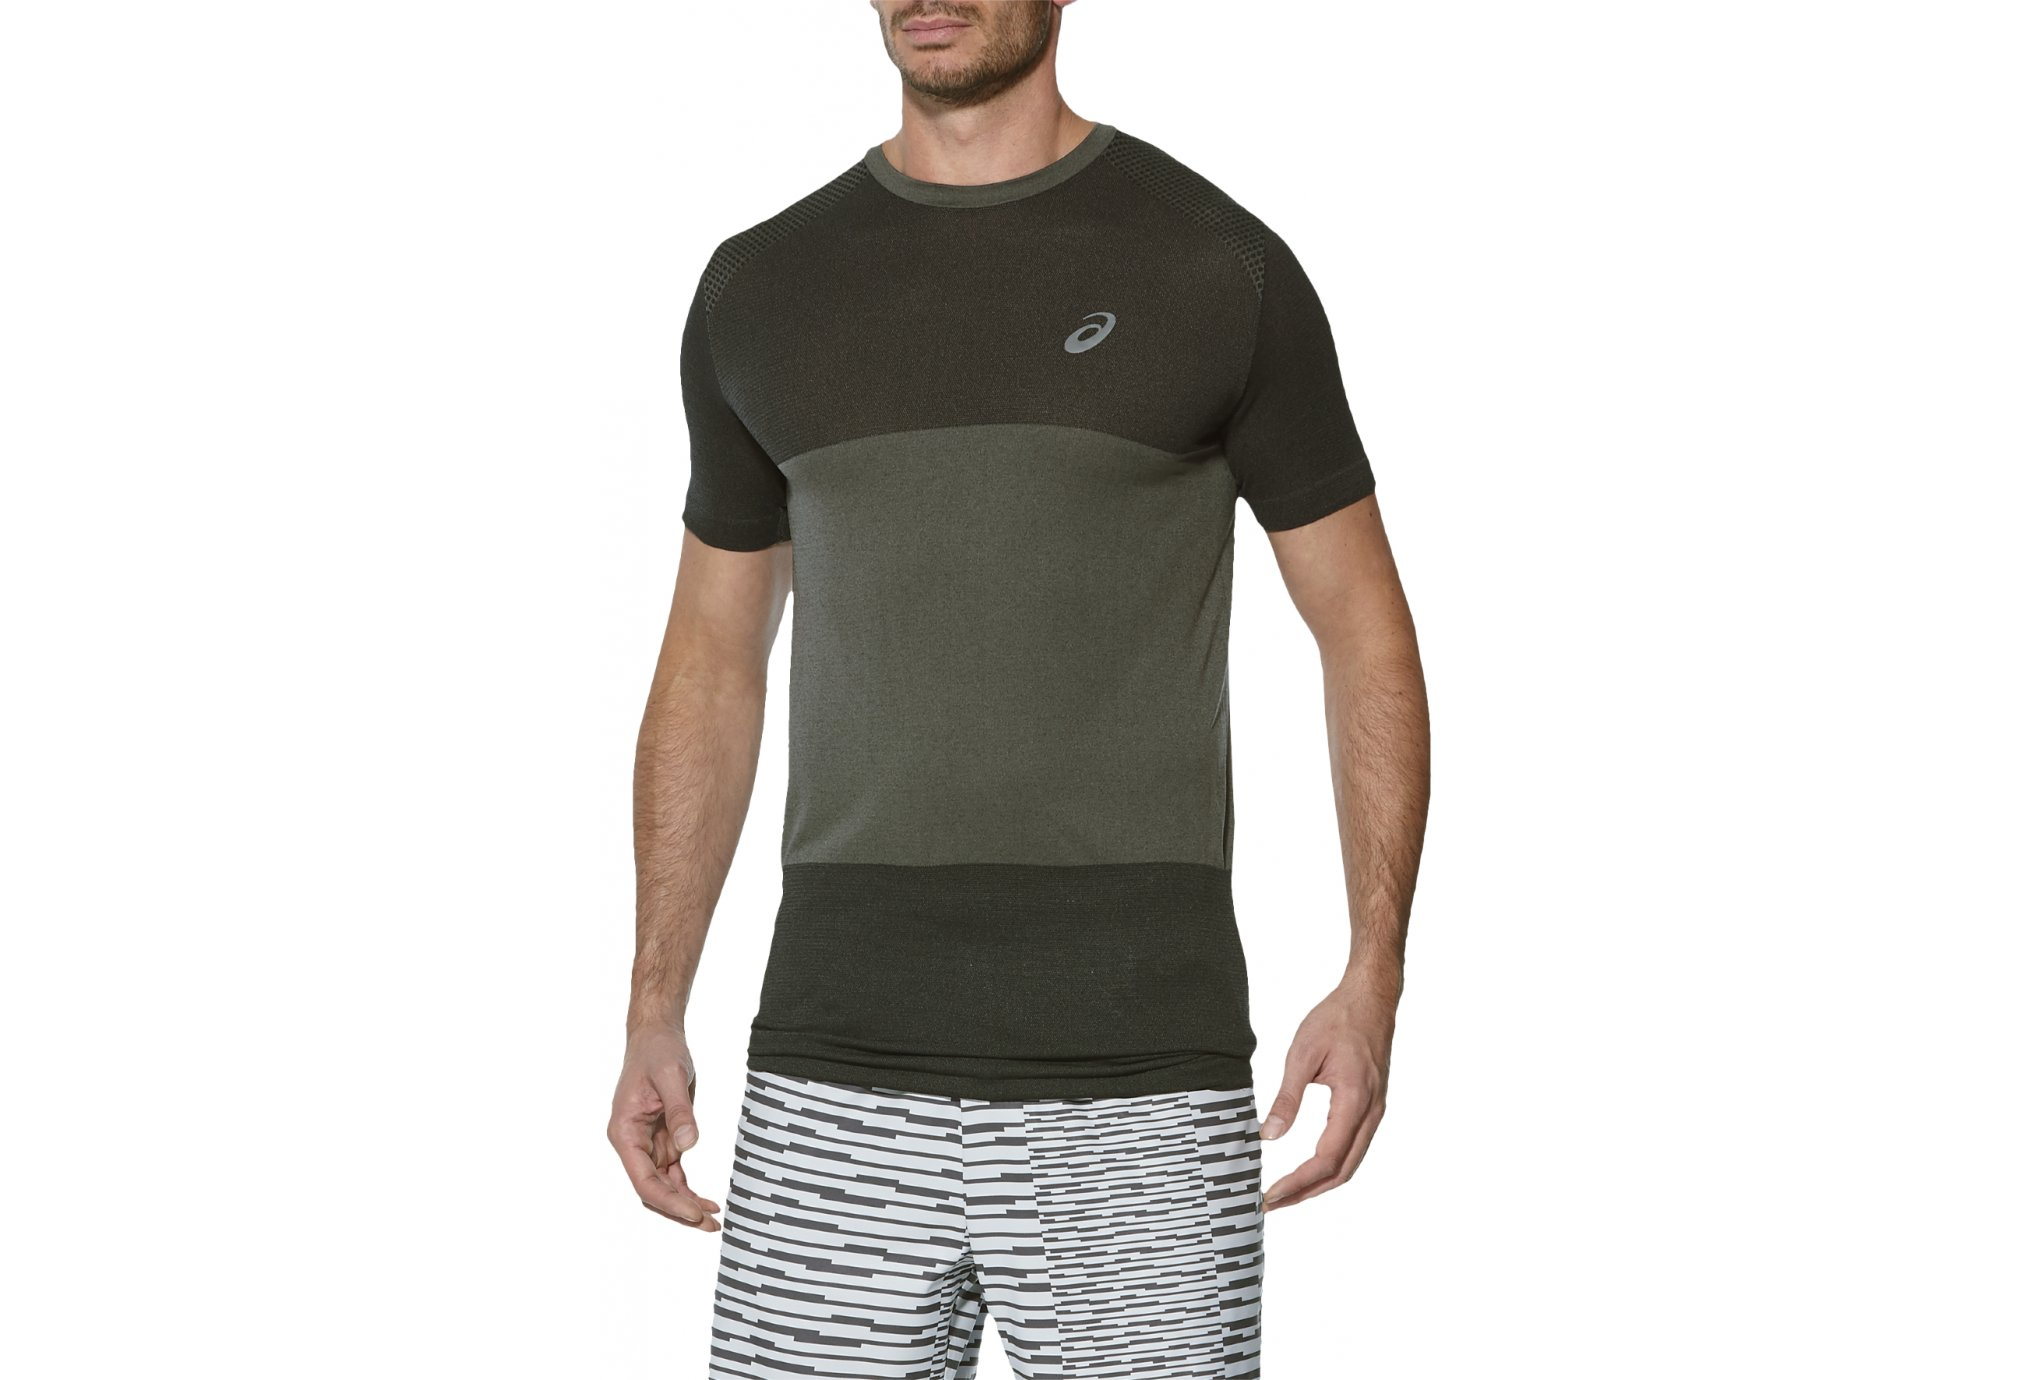 Asics FuzeX Seamless M vêtement running homme